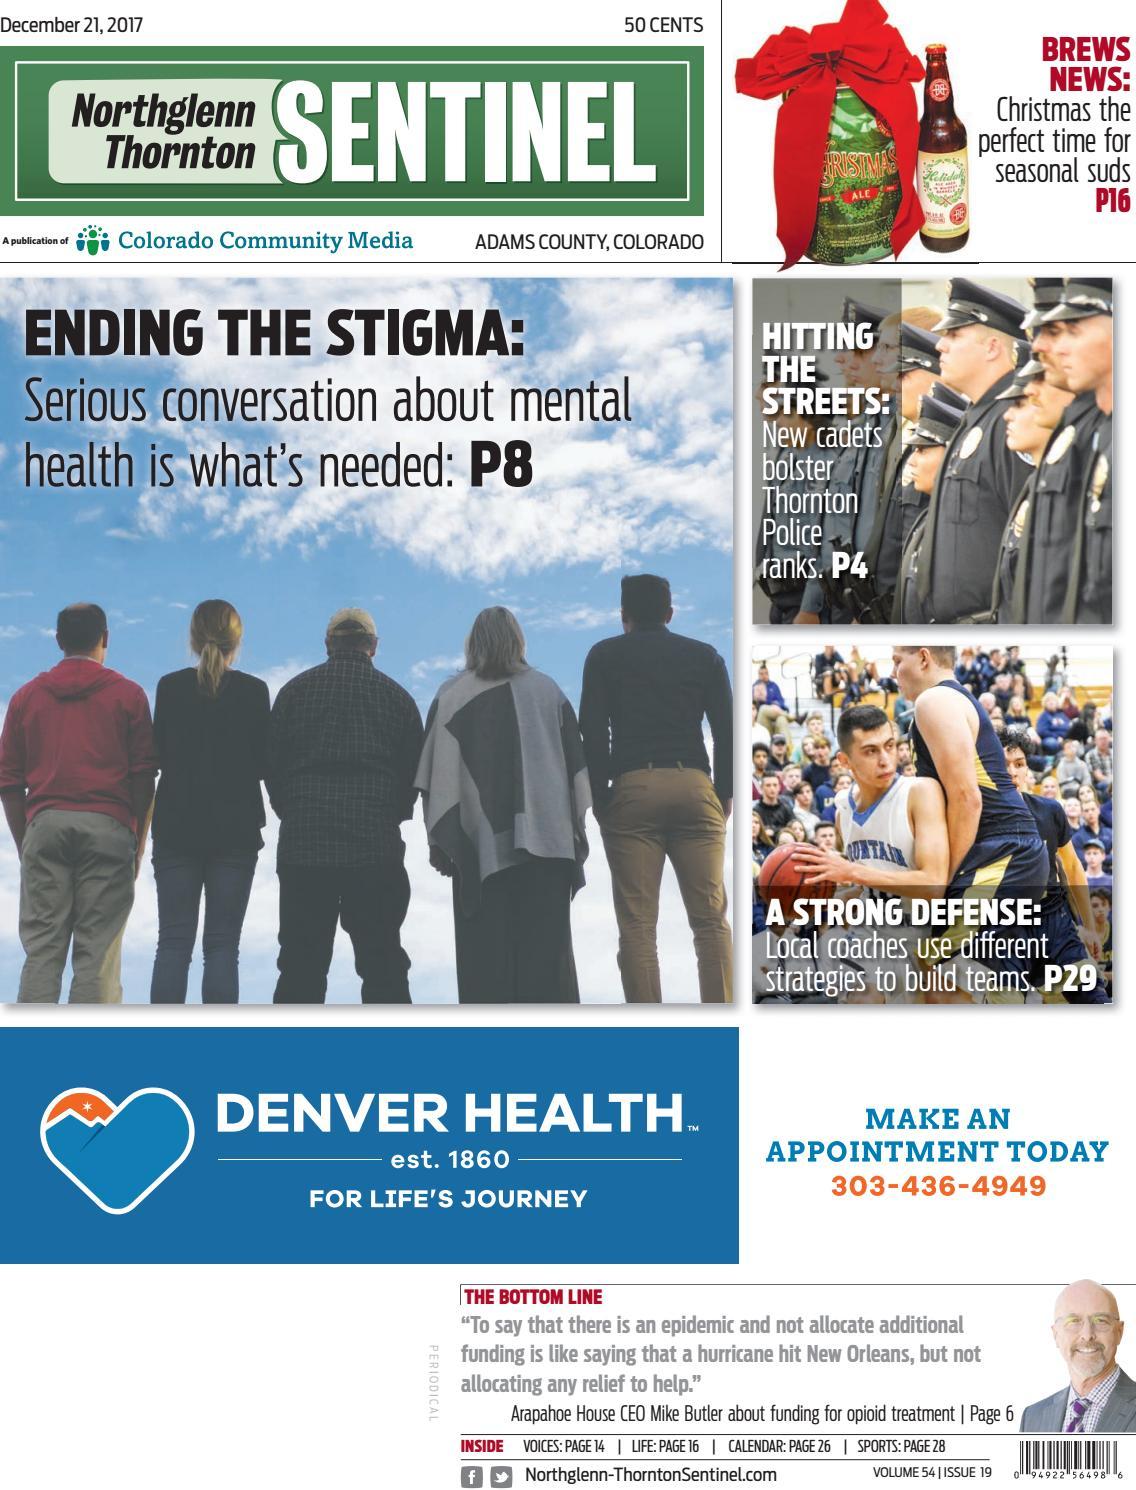 Northglenn Thornton Sentinel 1221 by Colorado Community Media - issuu